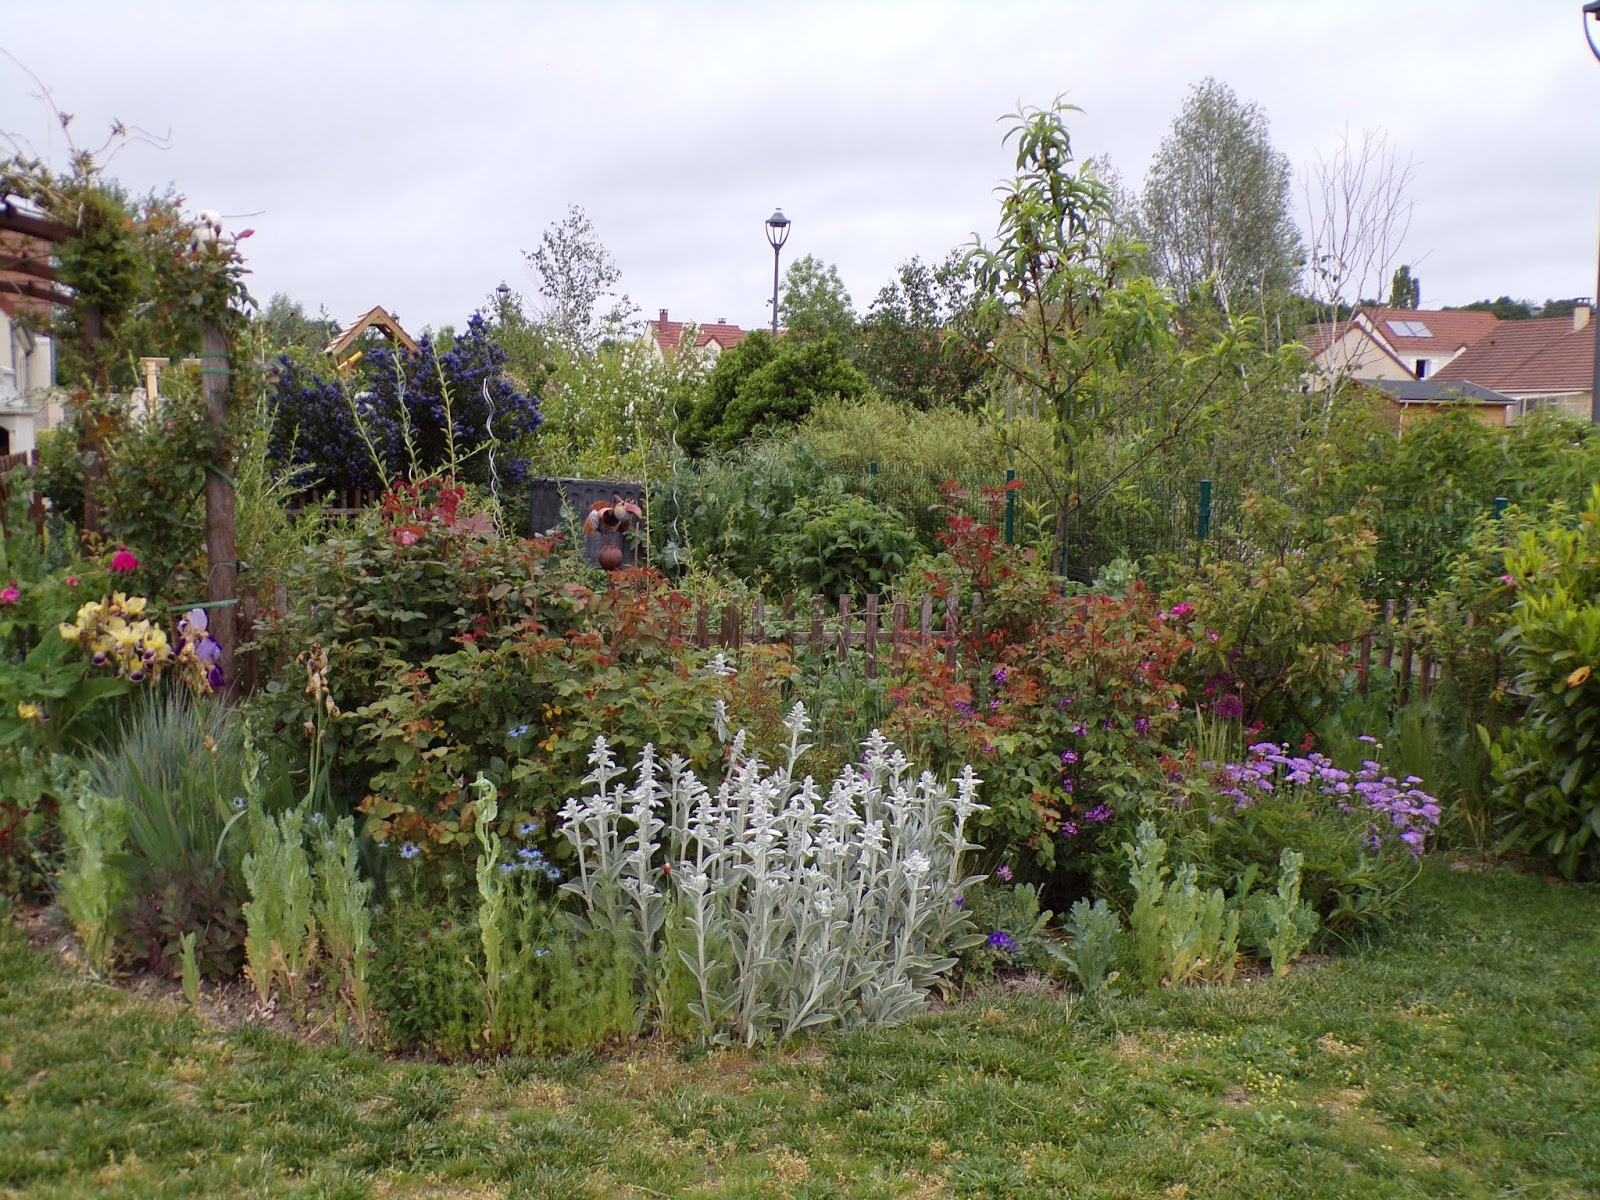 Mon petit jardin en Sologne: Le massif Invincibelle fin mai